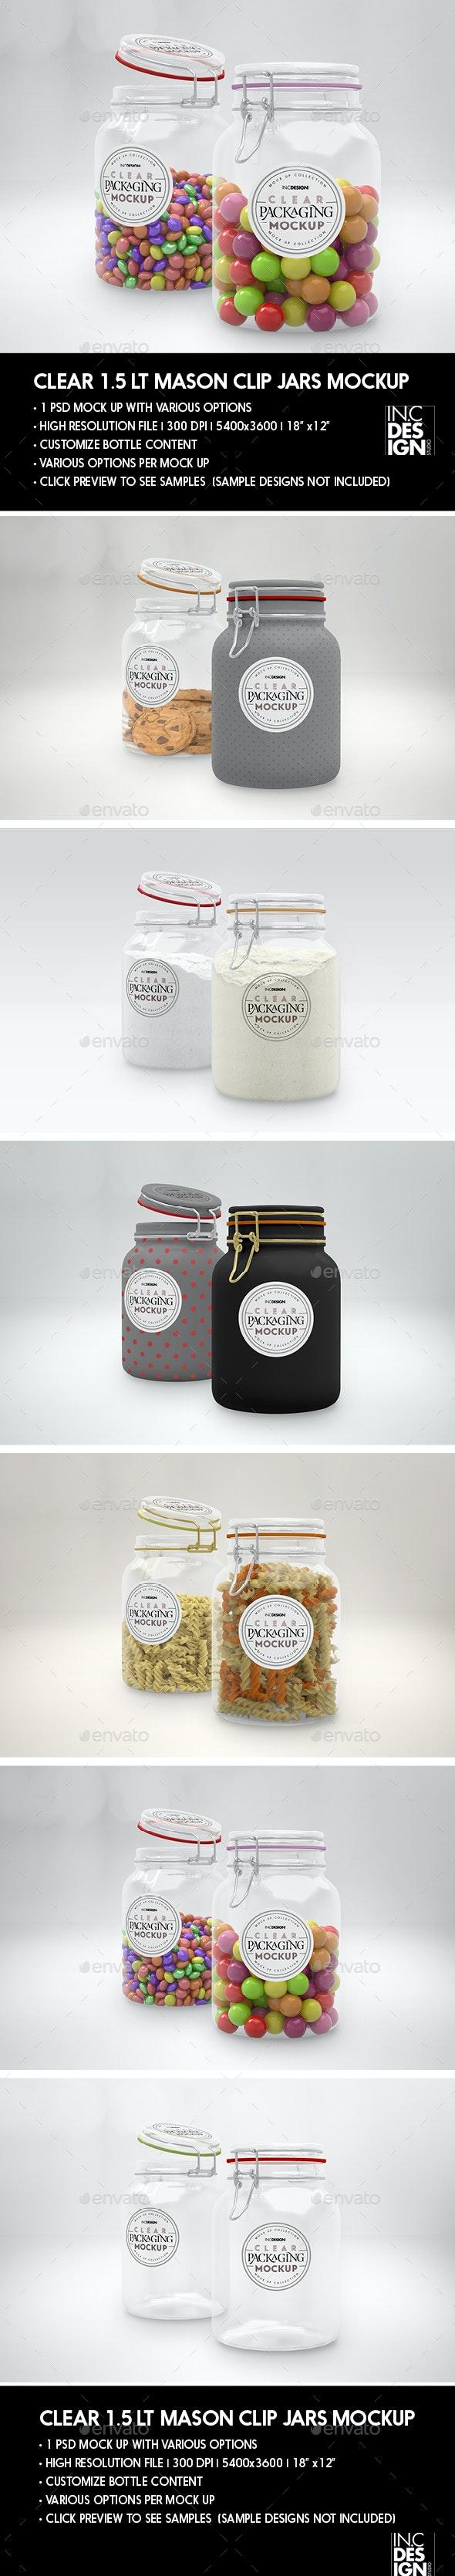 Clear 1.5 Liter Mason Clip Jar Packaging Mockup - Packaging Product Mock-Ups